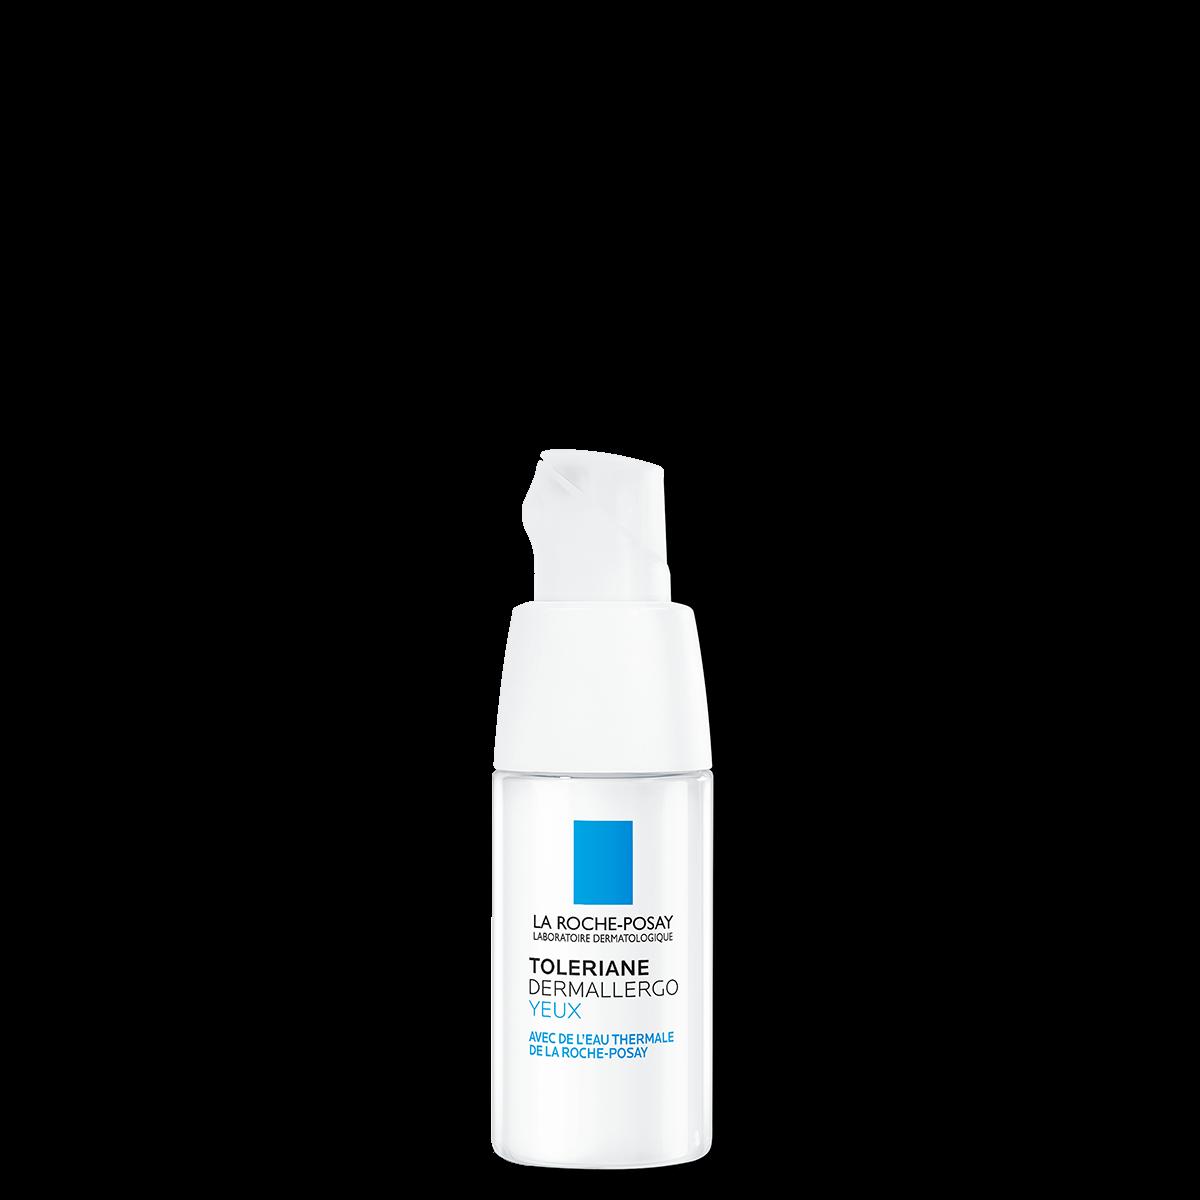 lrp-toleriane--dermallergo-eyes-front-packshot-FSS